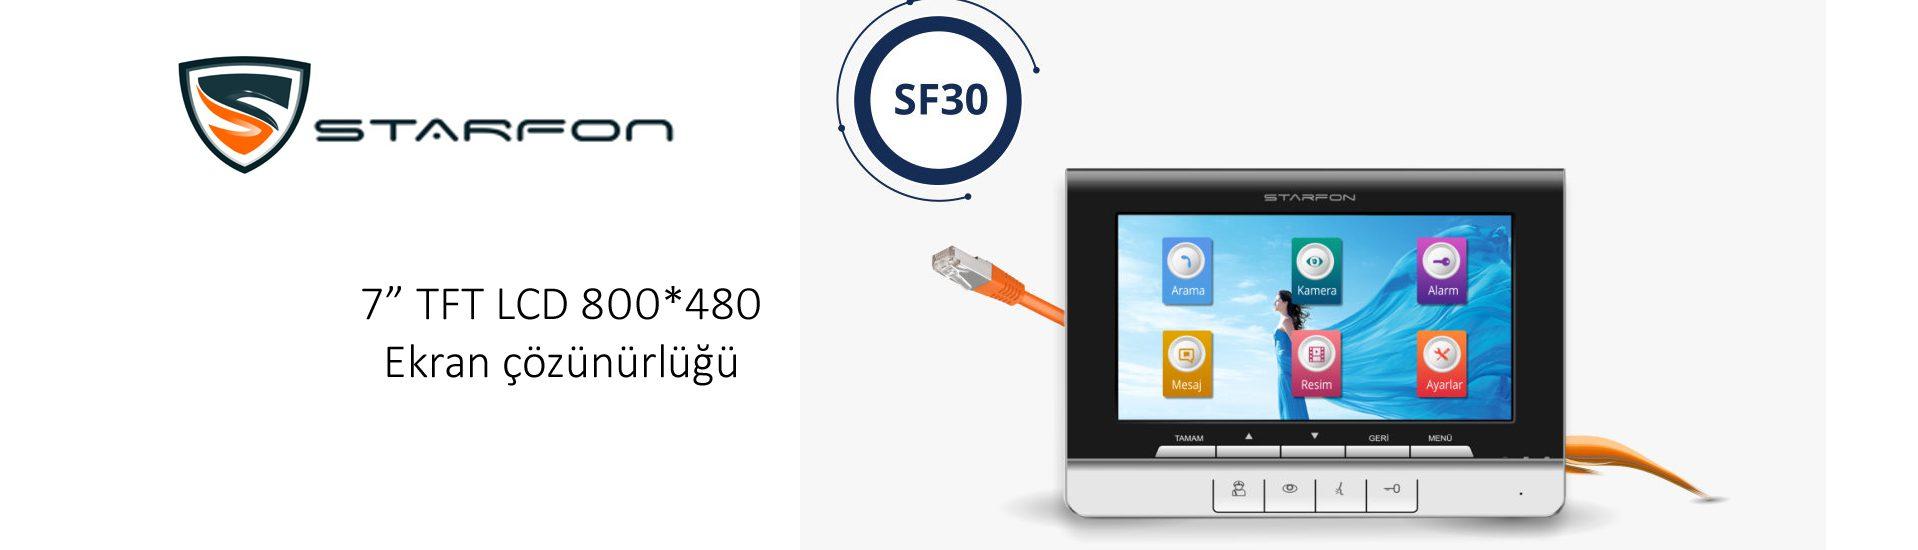 SF 30